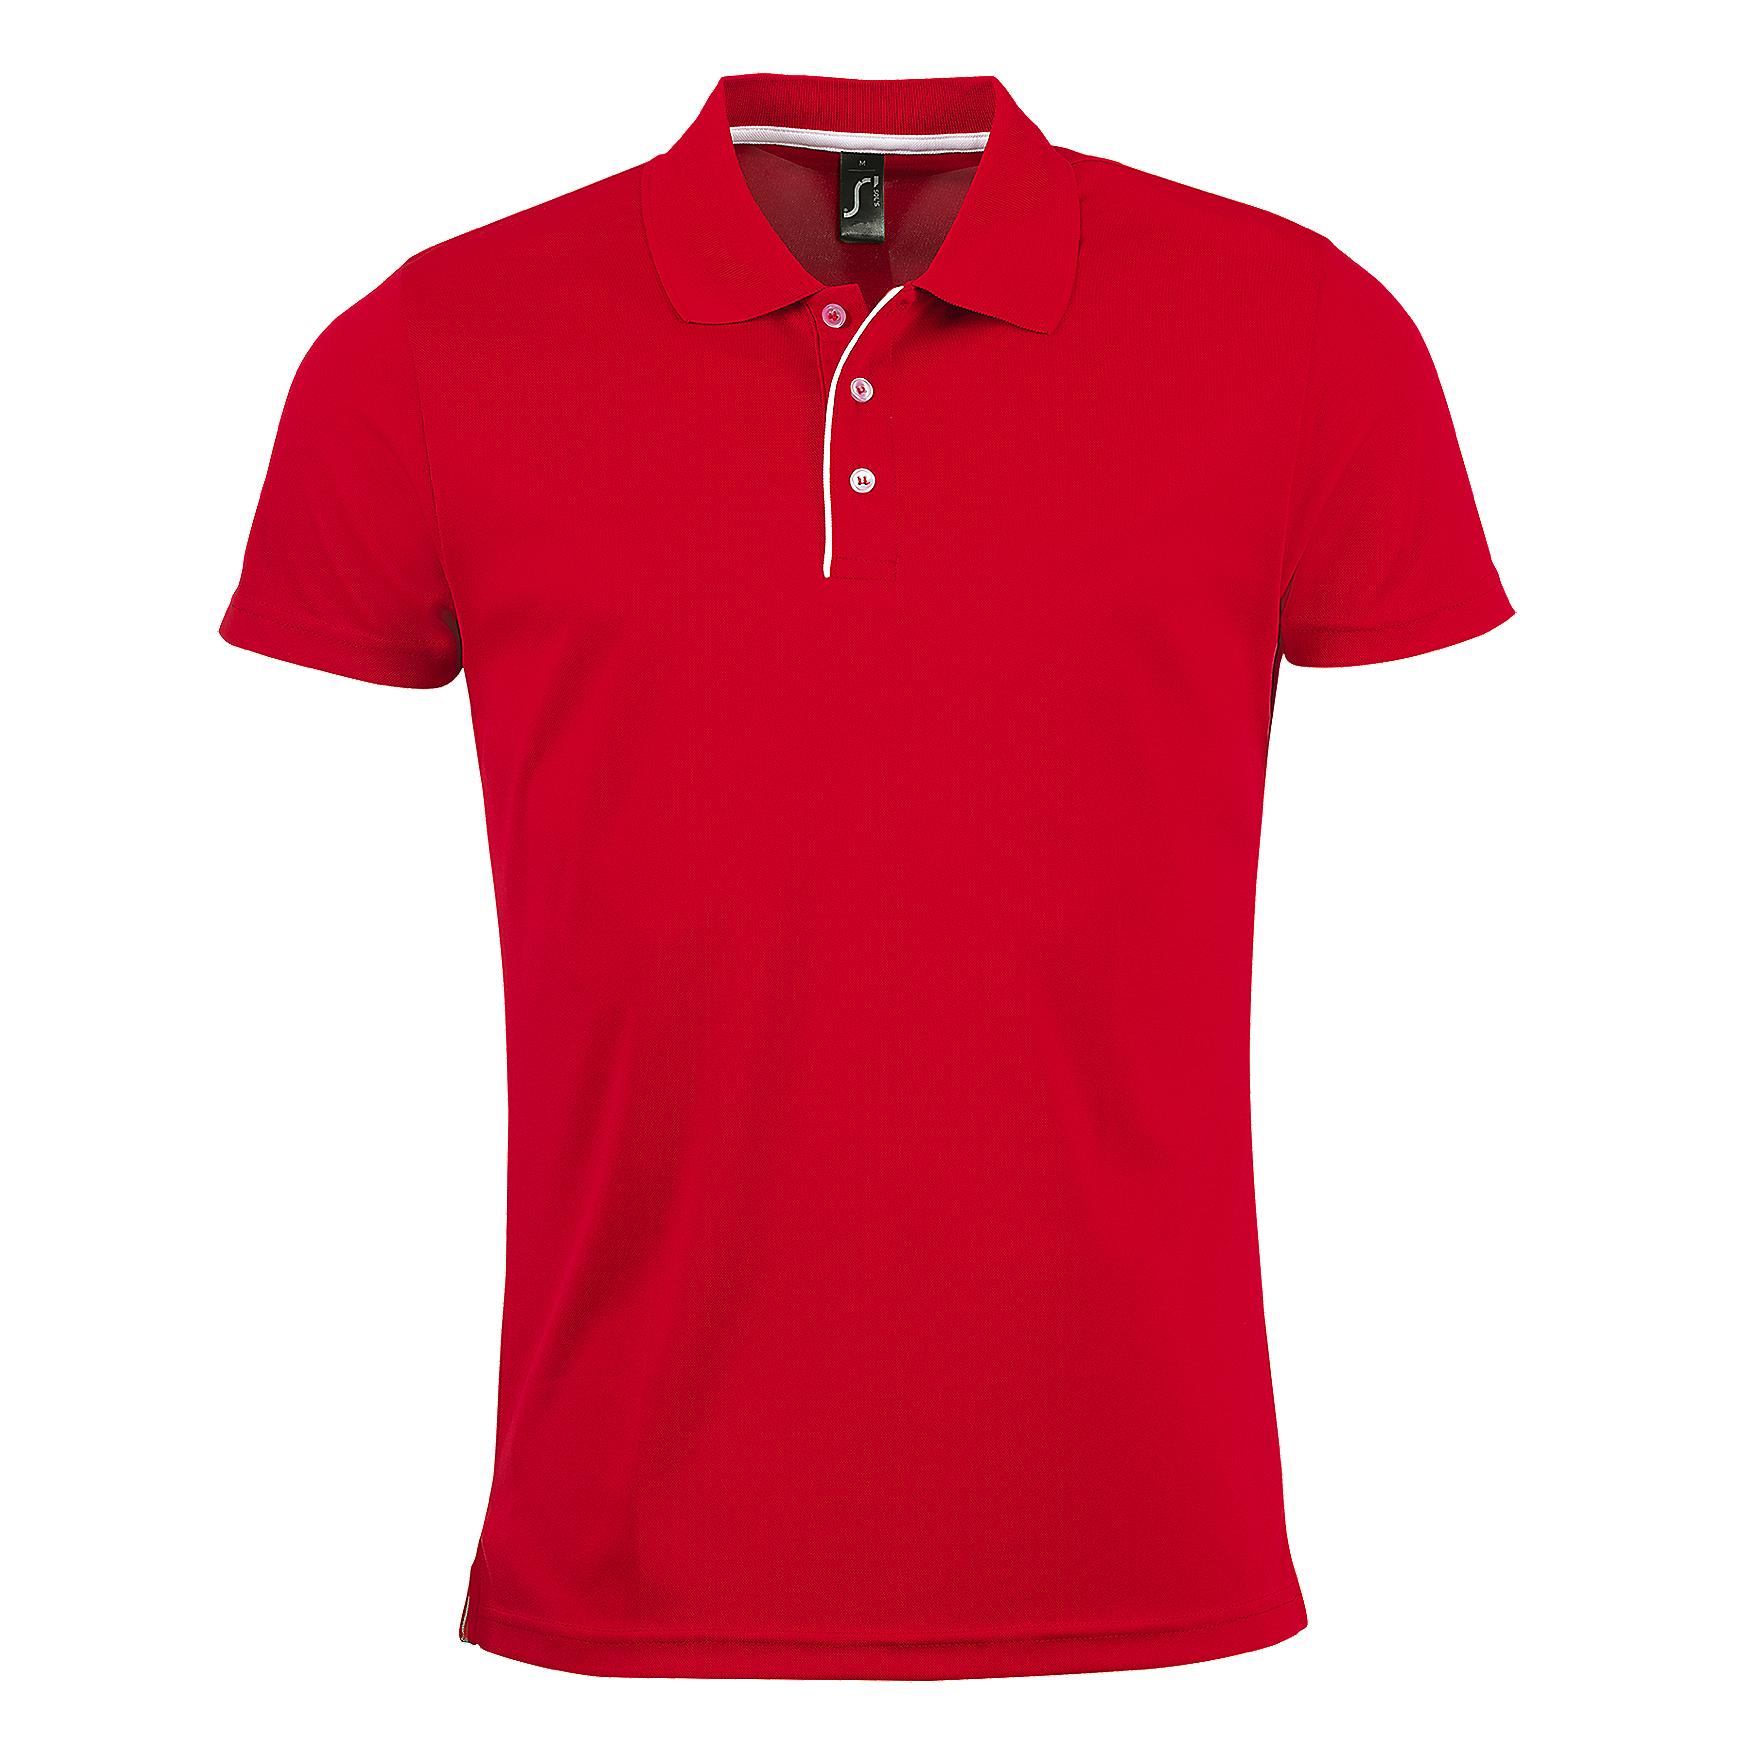 SOLS-Mens-Performer-Short-Sleeve-Pique-Plain-Casual-Fashion-Polo-Shirt-PC2162 thumbnail 20